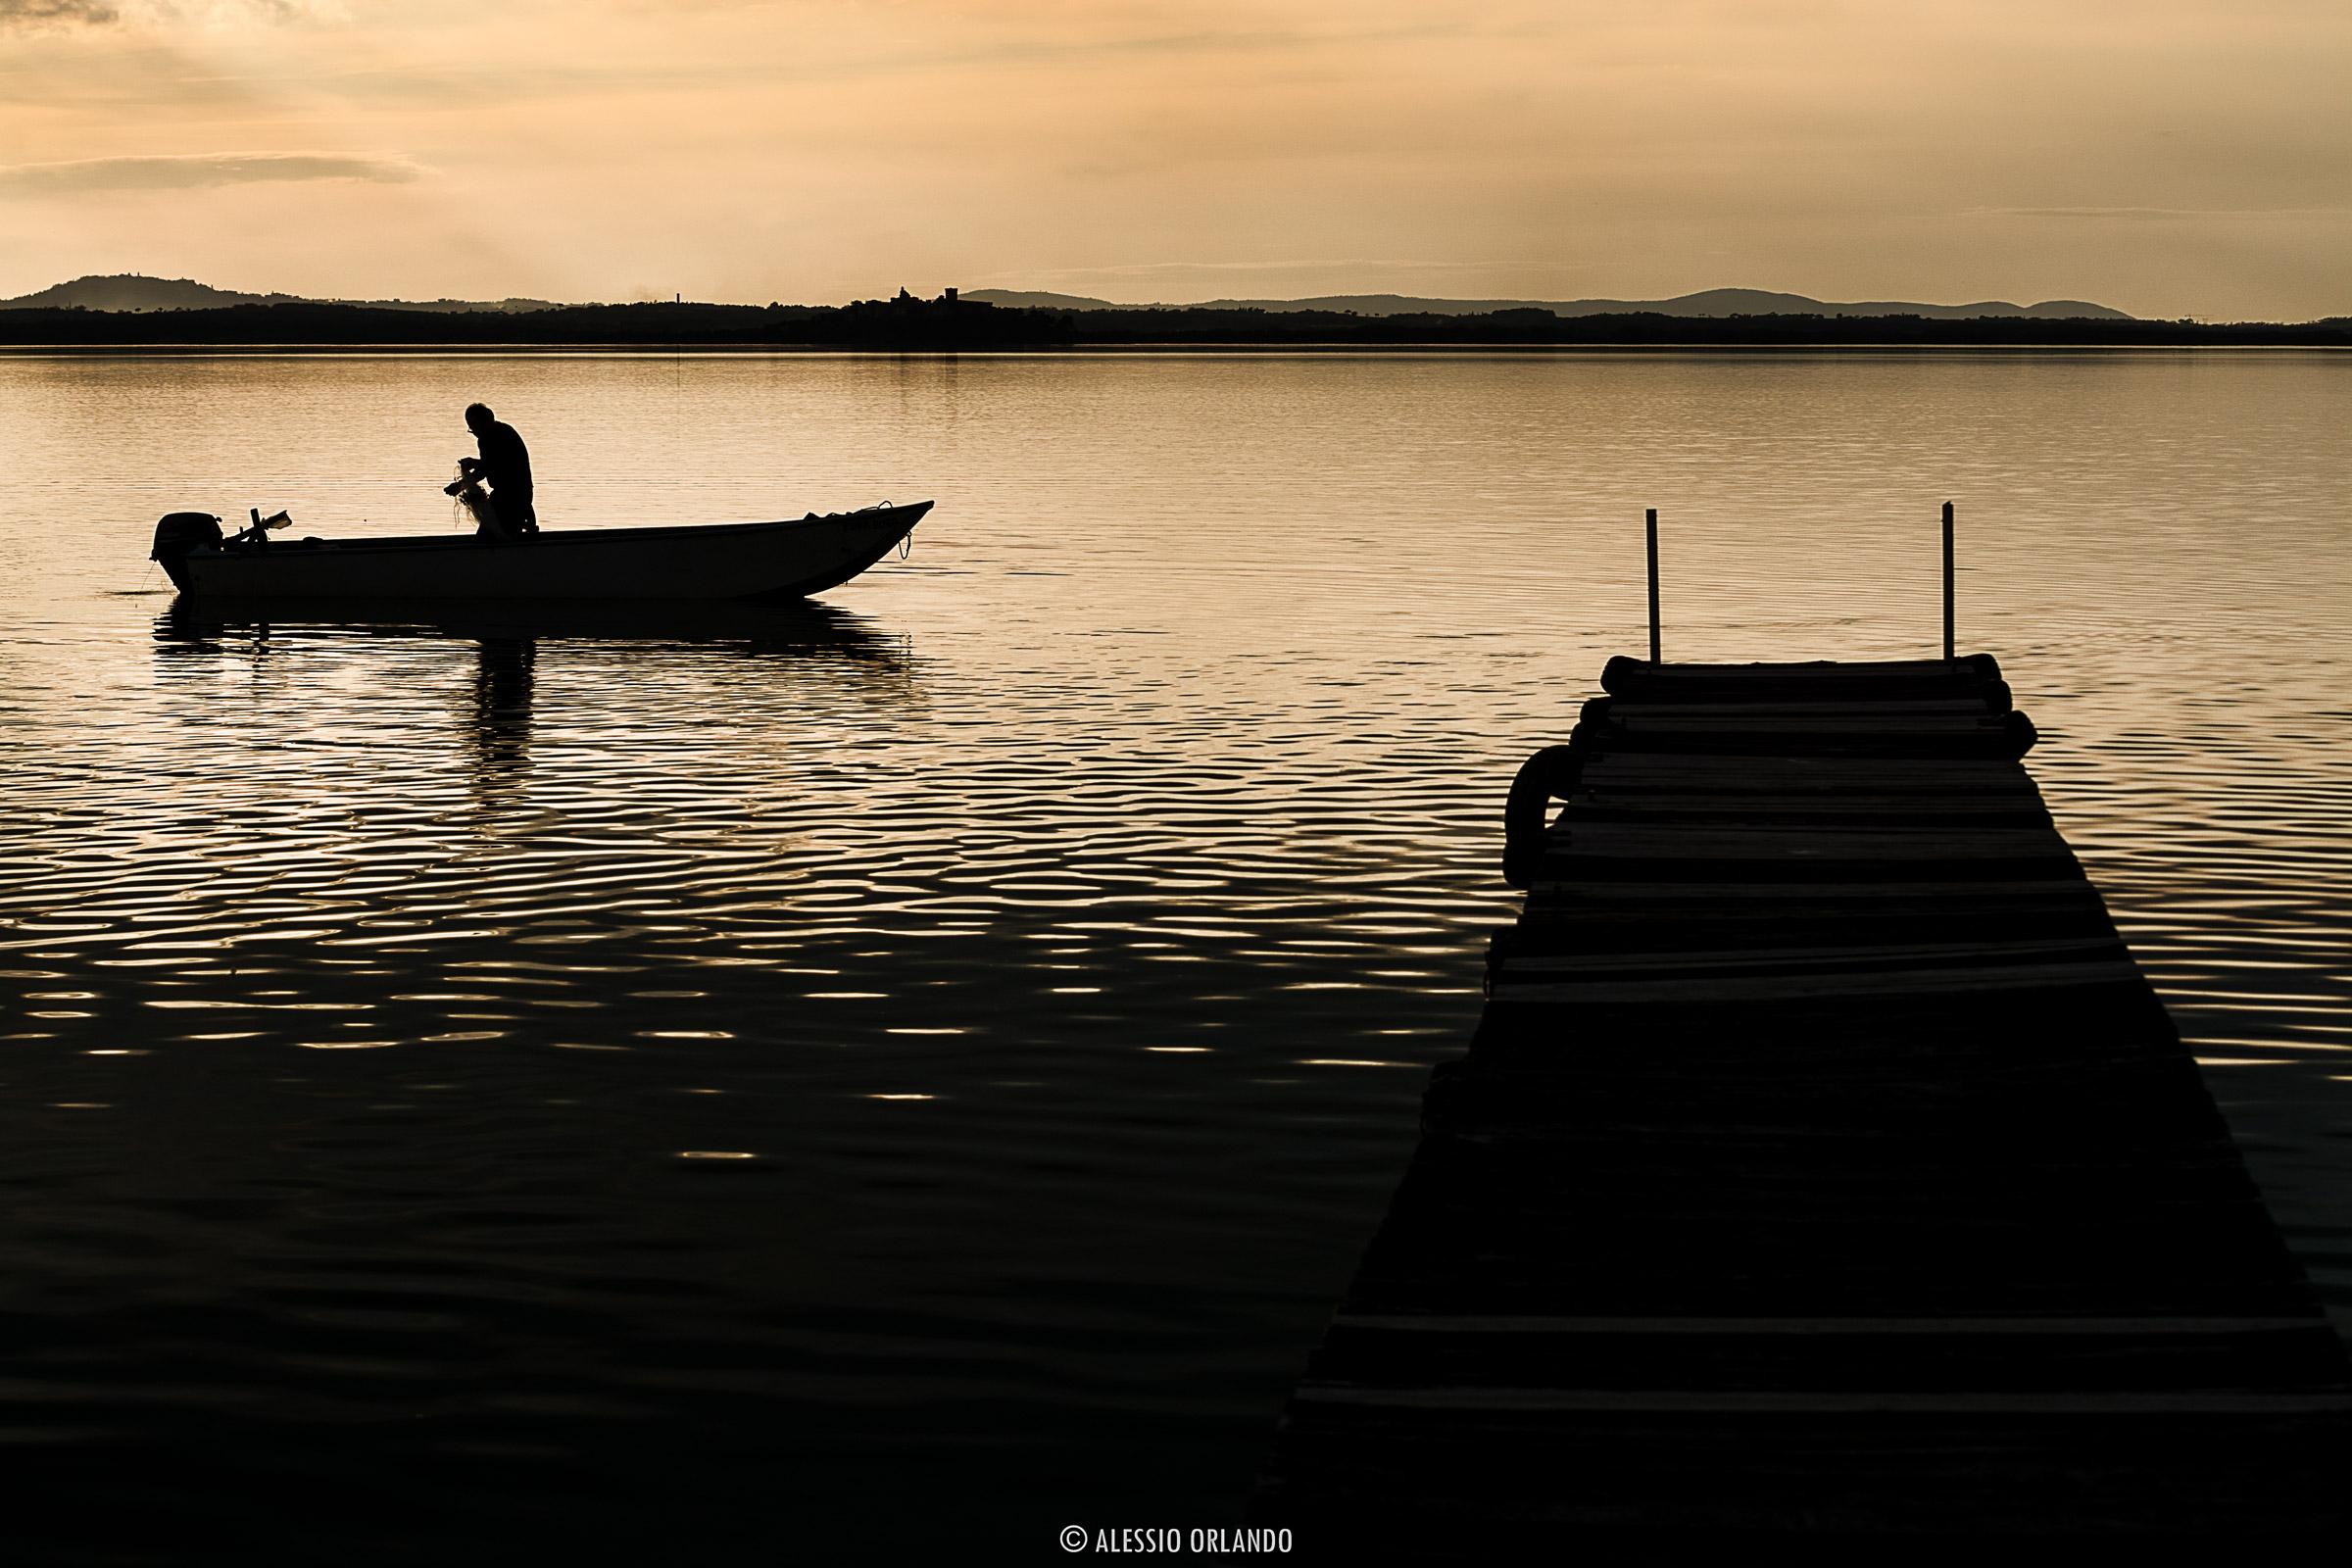 Fishing force pulls fisherman...